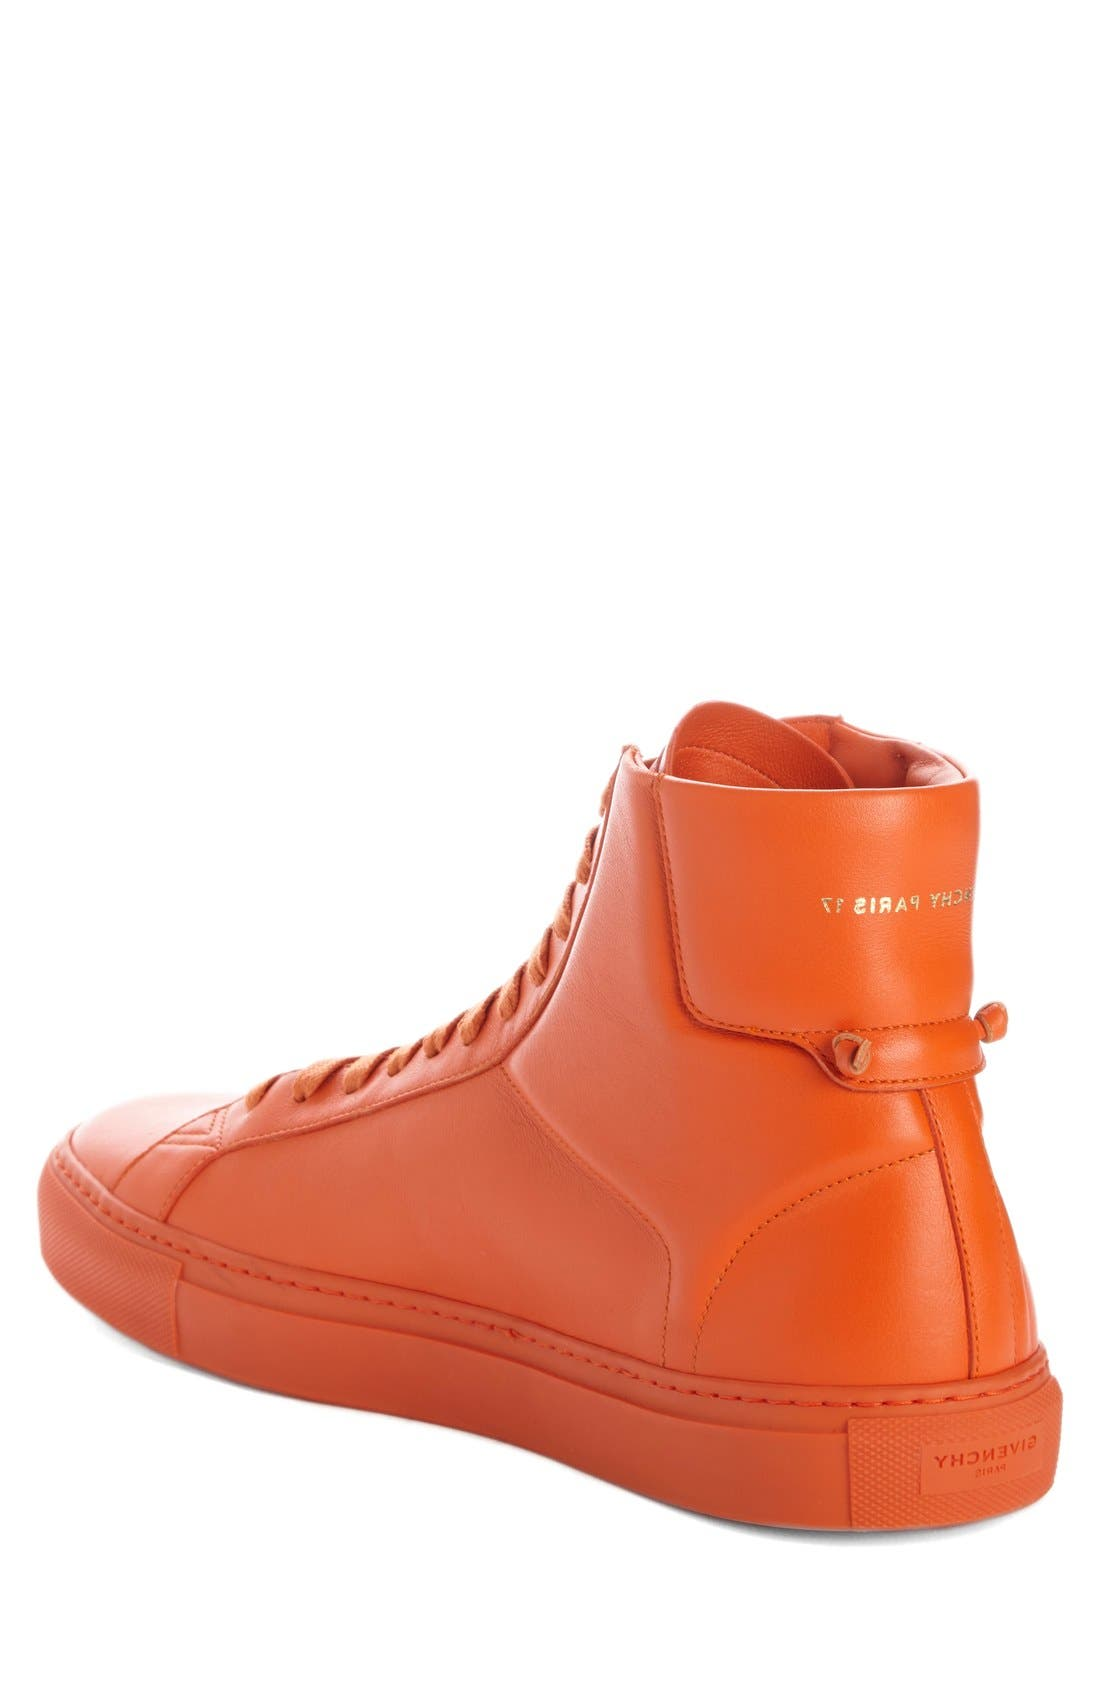 Alternate Image 2  - Givenchy 'Urban Knots' High Top Sneaker (Men)